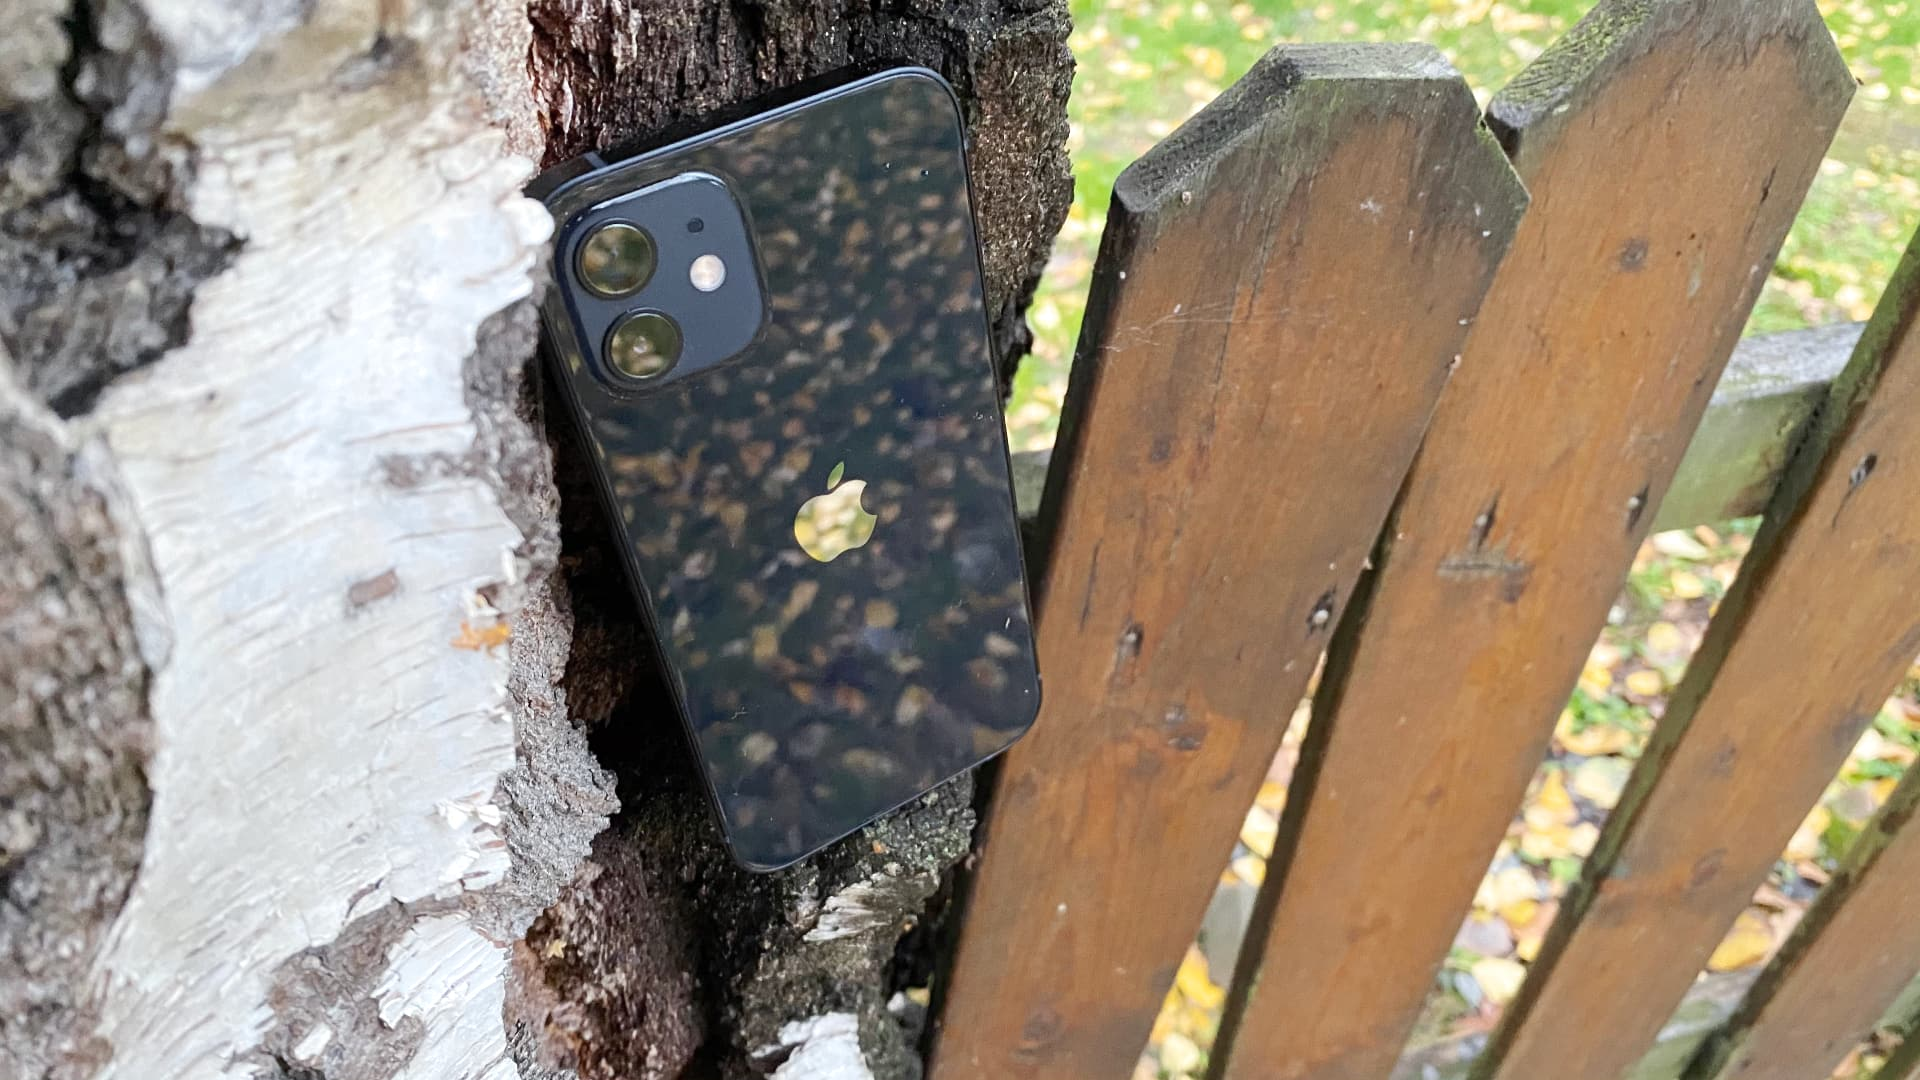 Apple Iphone 12, Svart, i träd, baksida